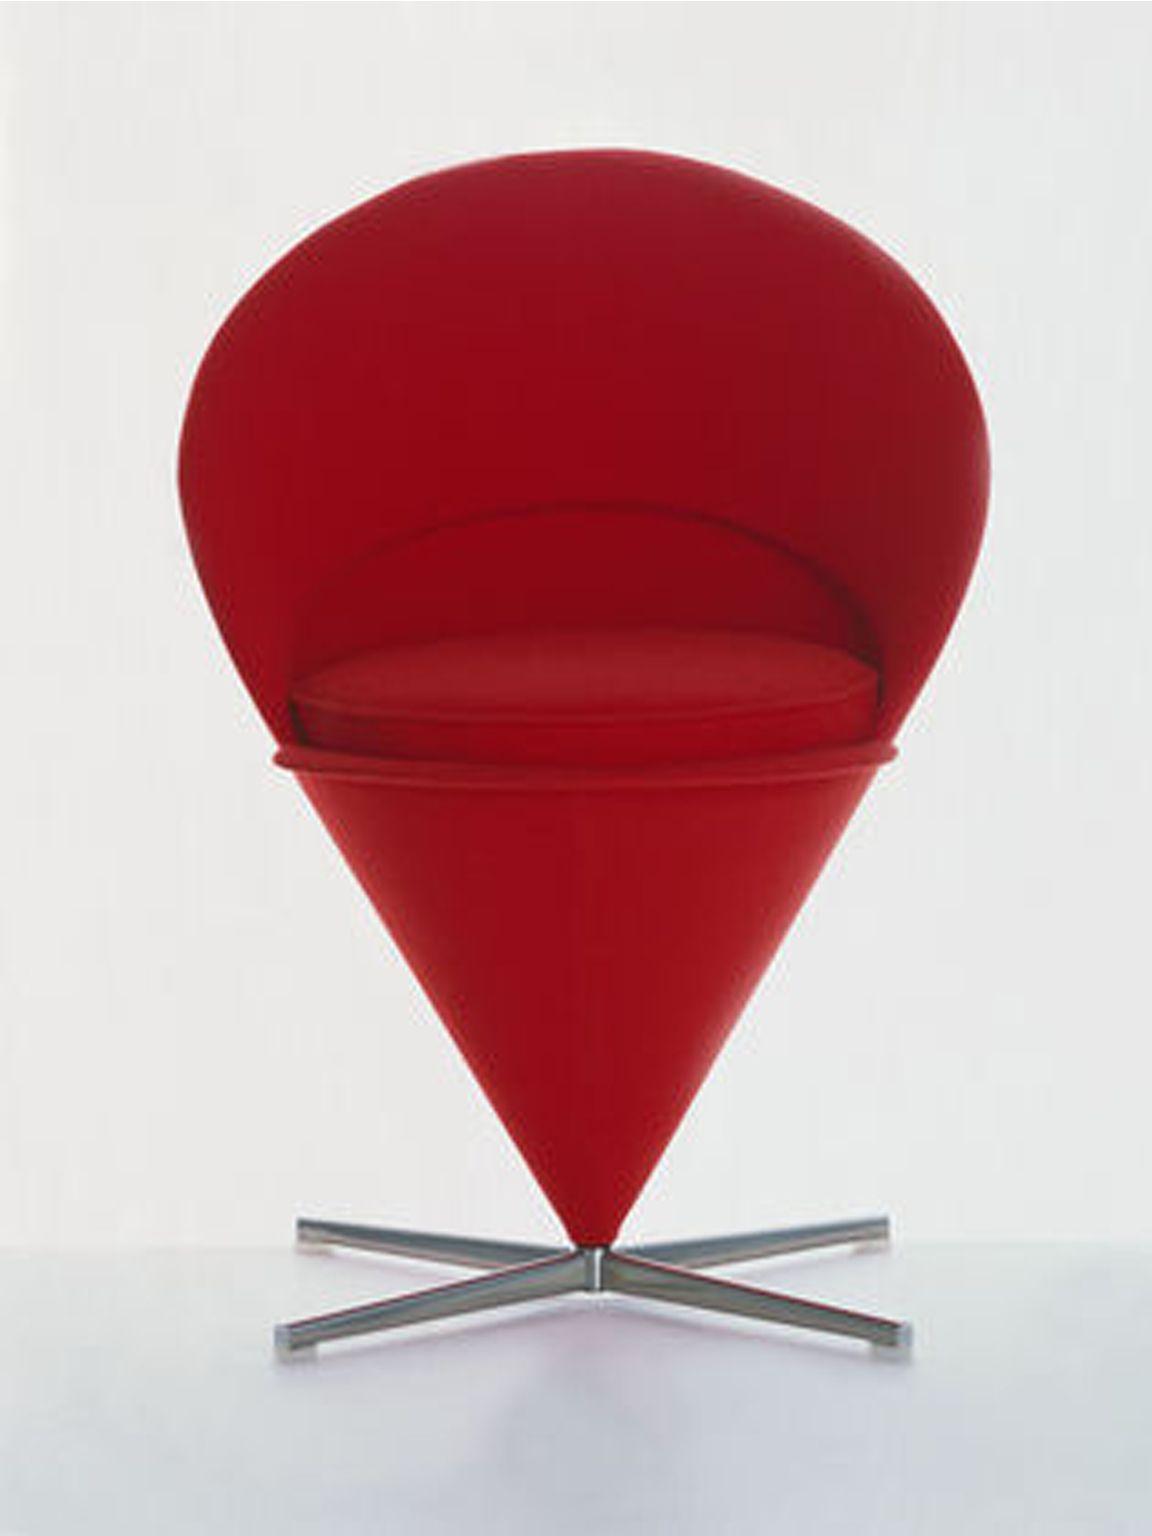 Cone chairverner panton for vitra tavolo e sedie sedia